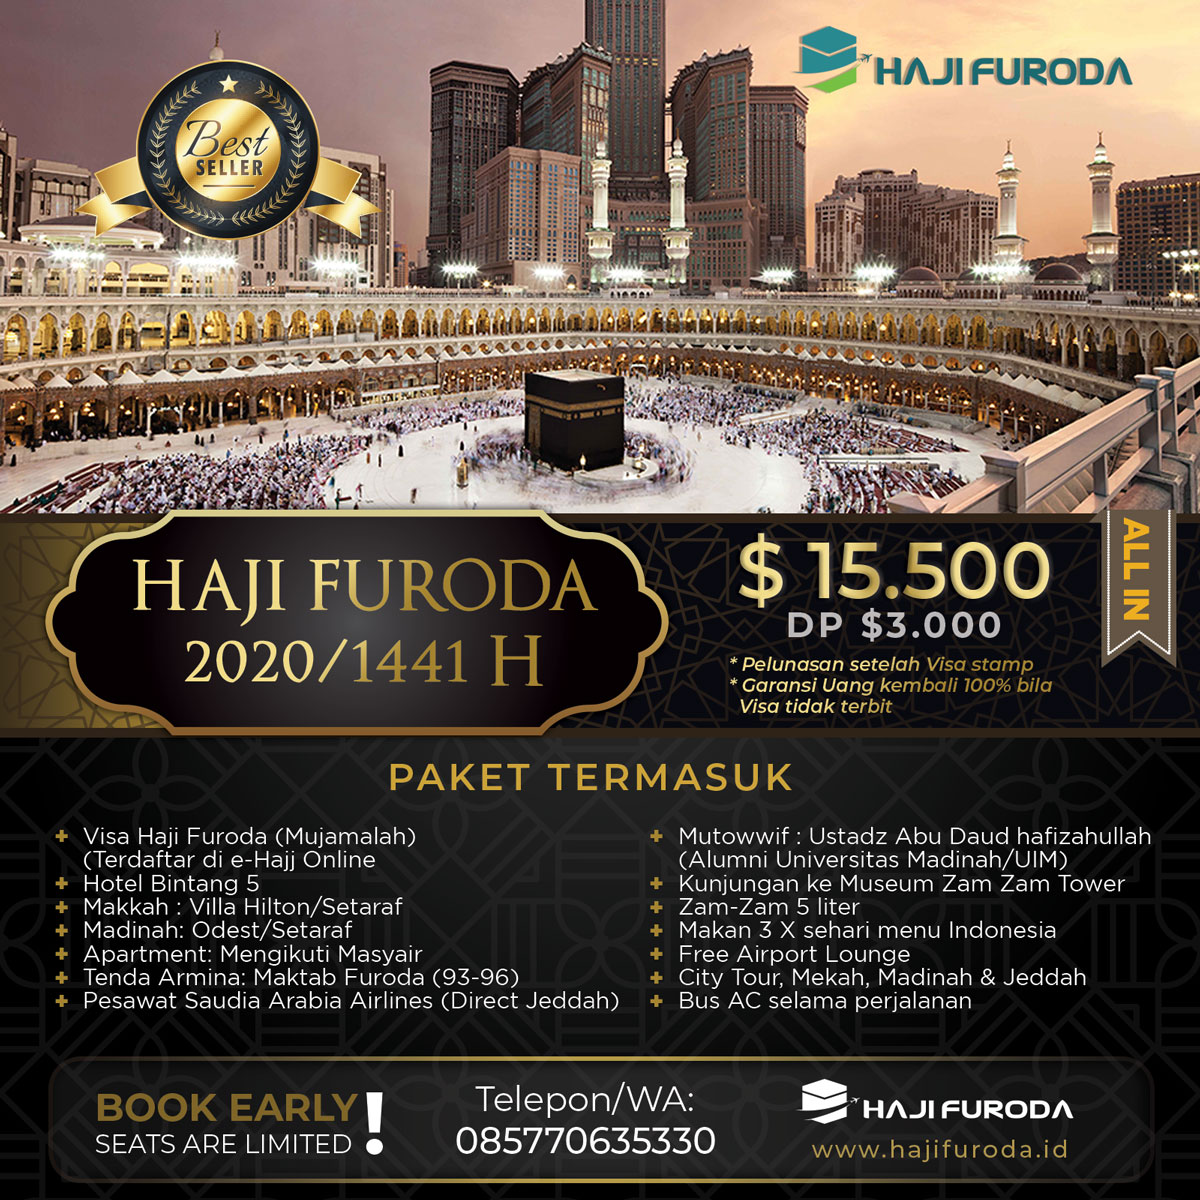 Biaya Haji Furoda Malang